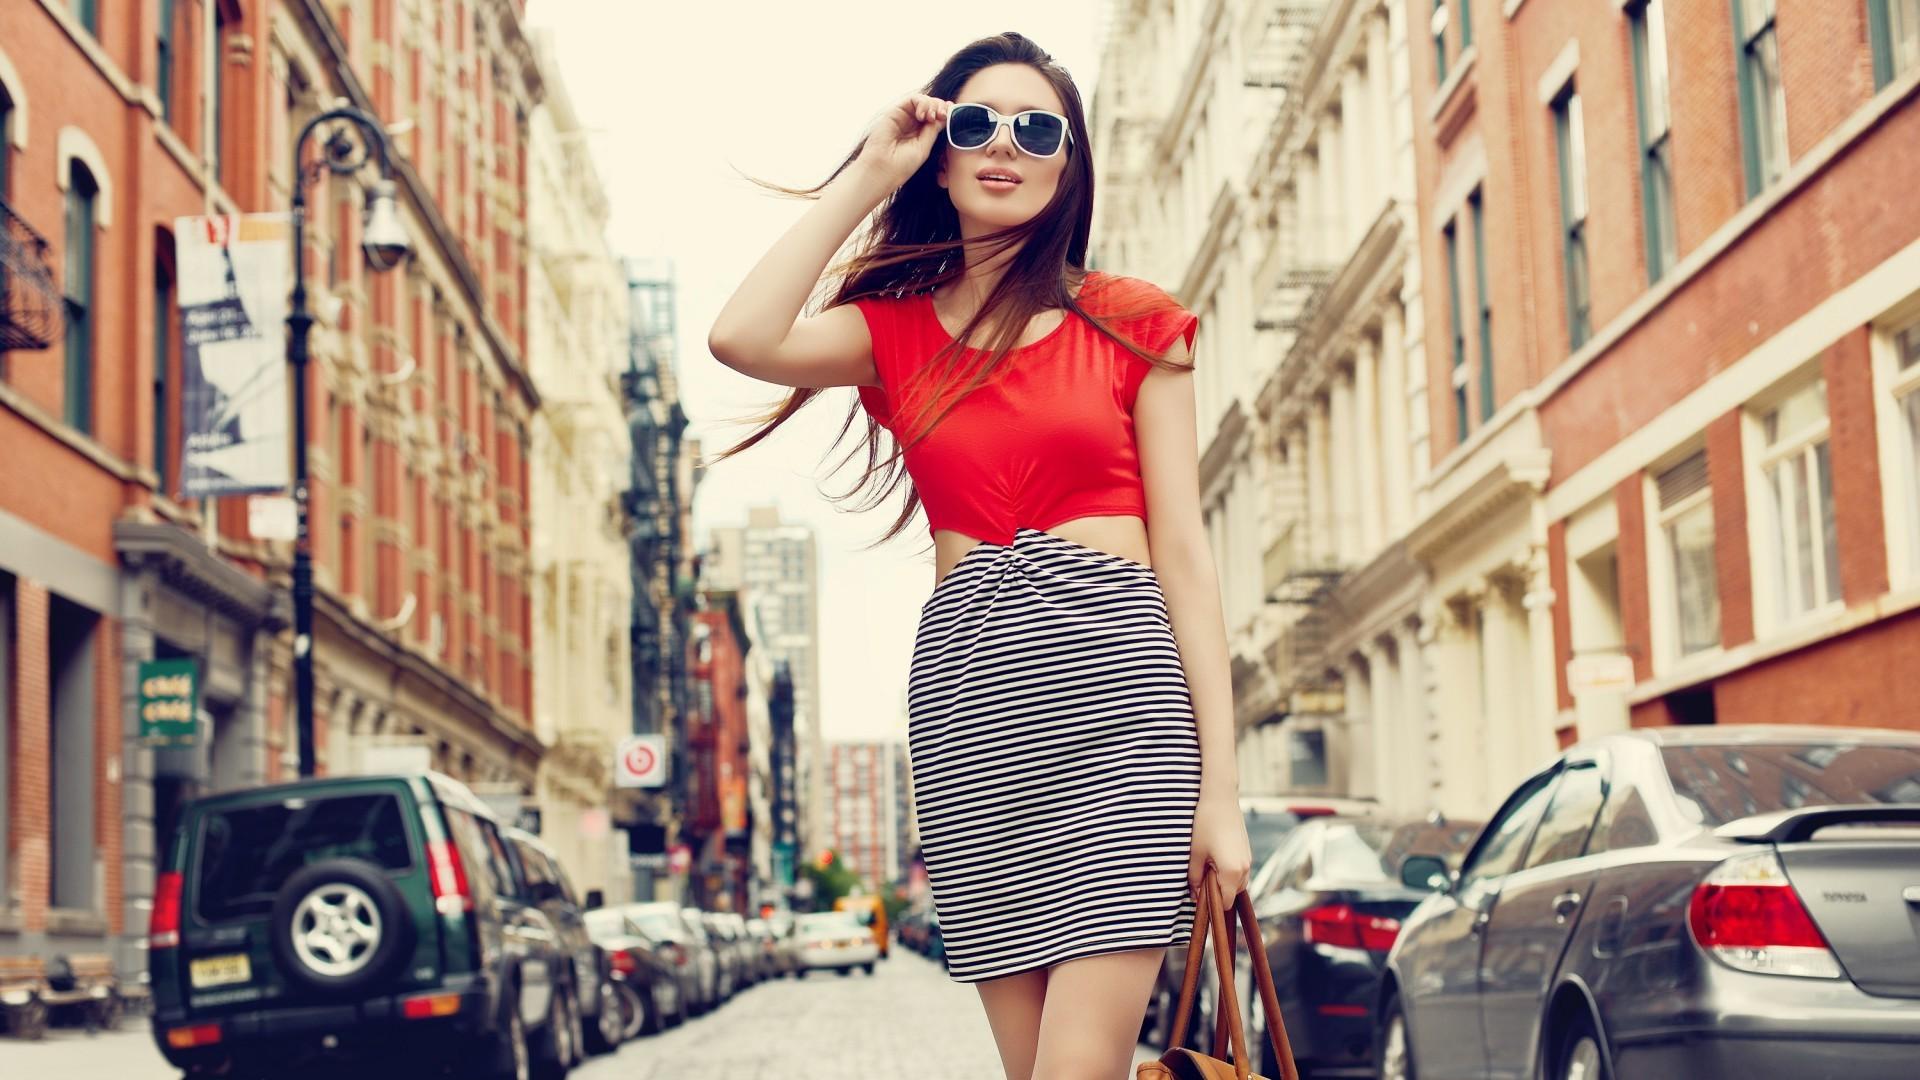 Girls_Beautiful_girl_walking_down_the_street_098073_.jpg